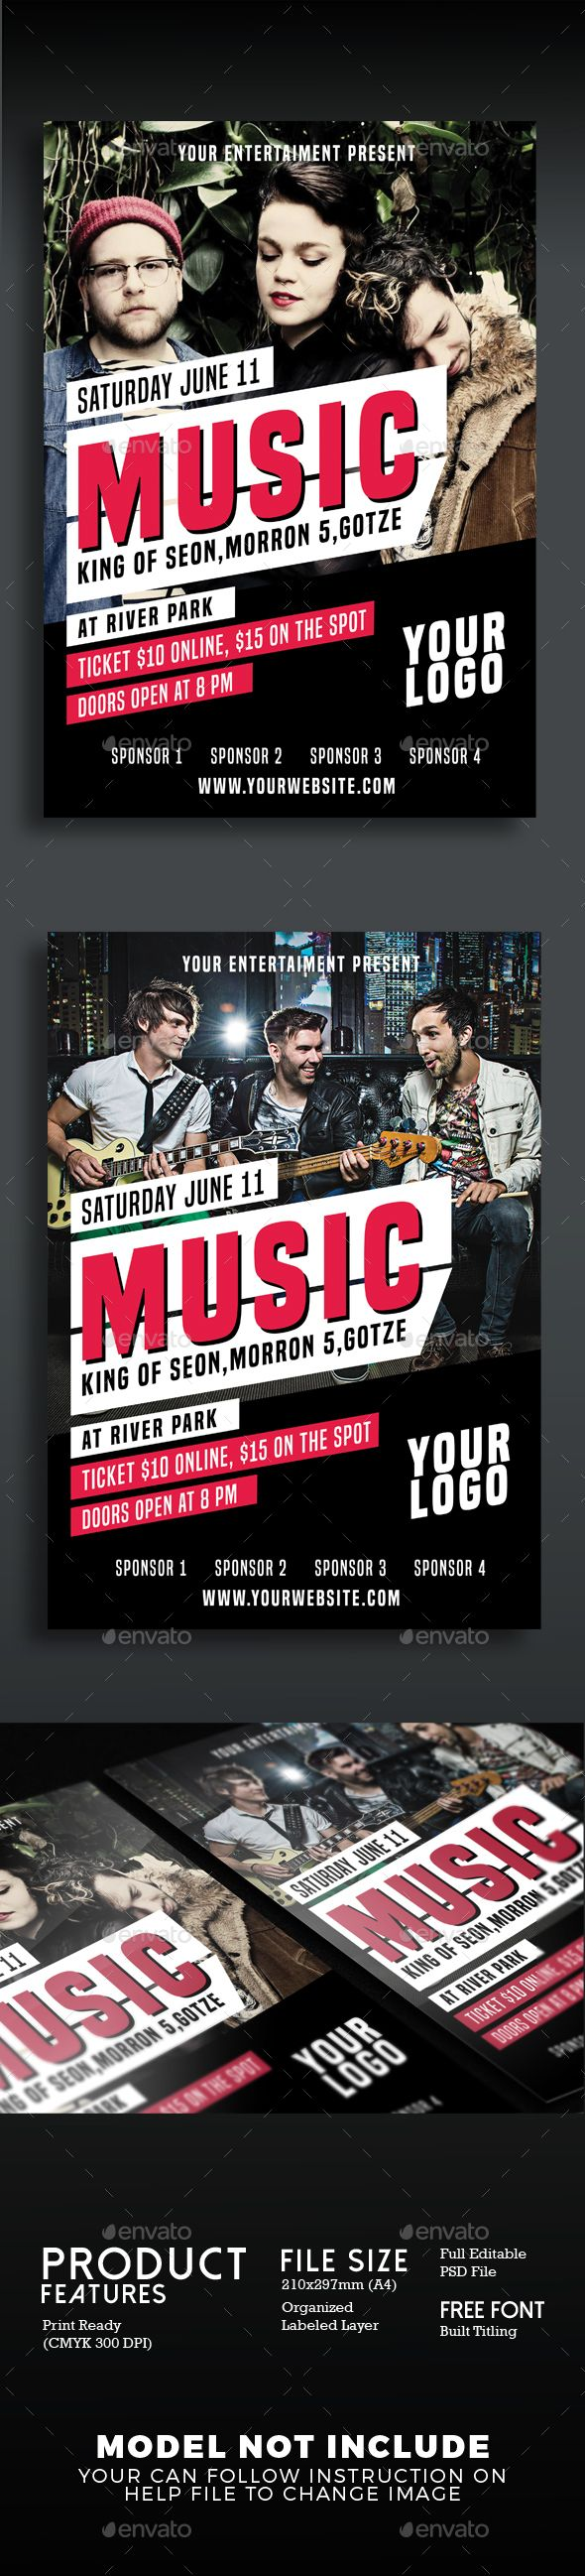 Music Concert Flyer | Concert flyer, Flyer template and Template